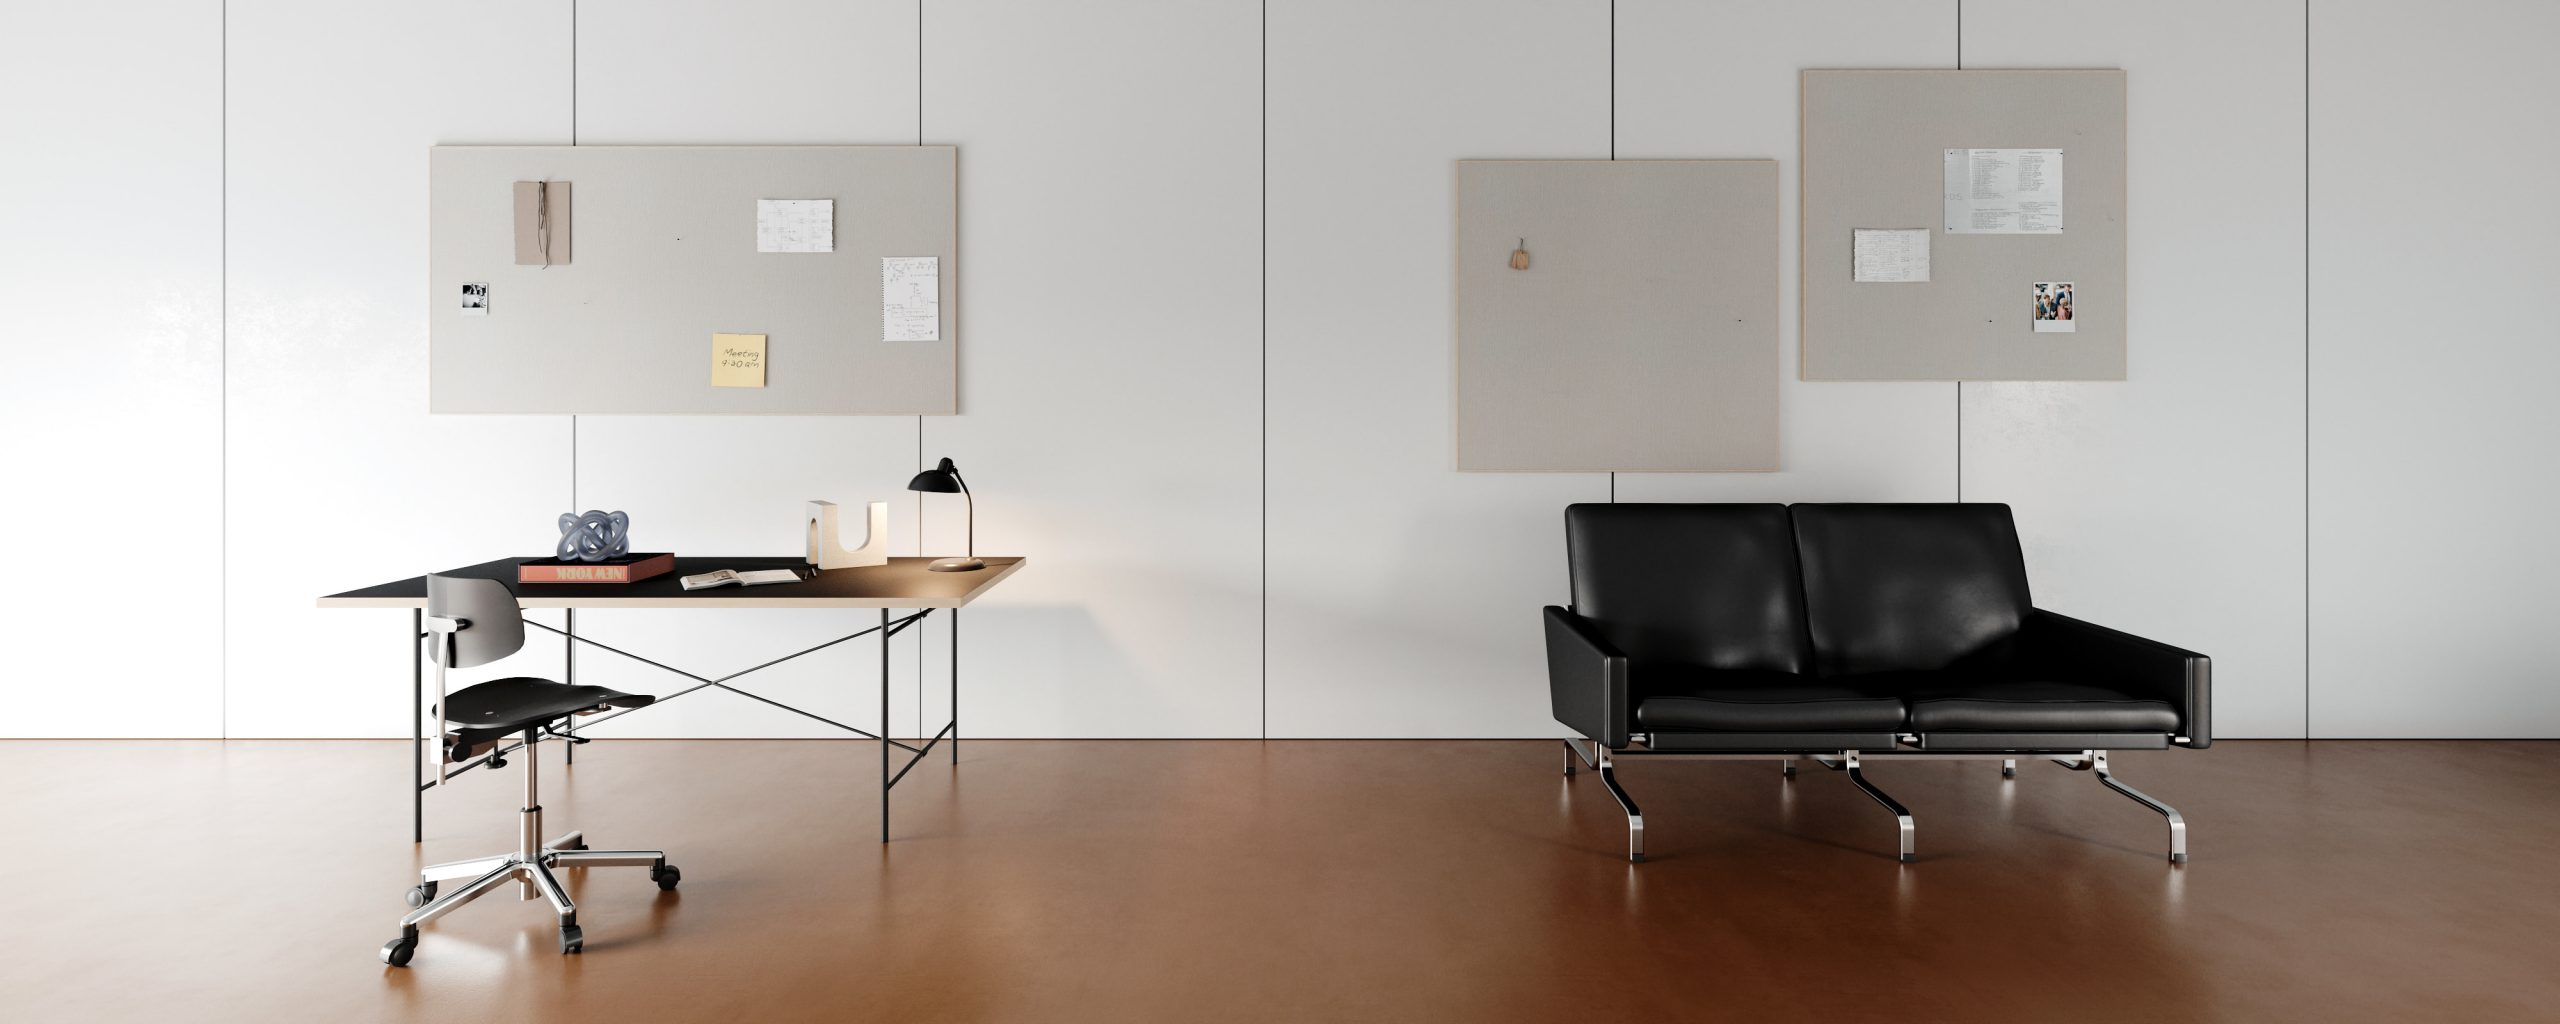 Akuart office with sofa